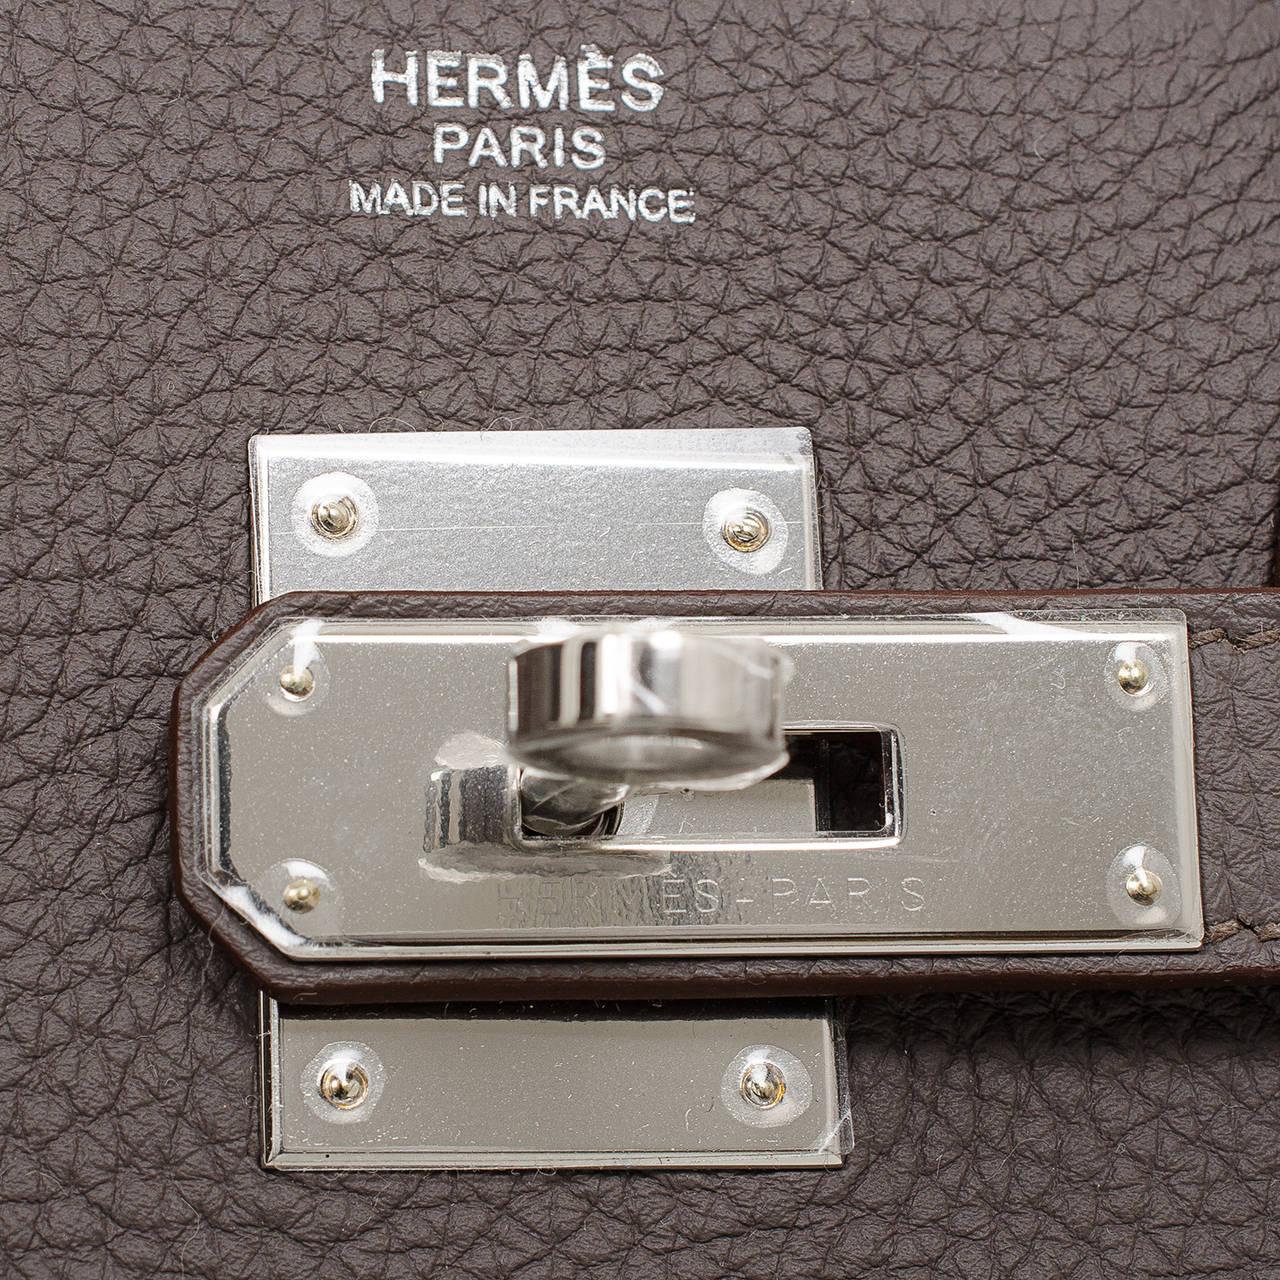 replica hermes birkin 40 - Hermes Etain Togo Birkin 30cm Palladium Hardware at 1stdibs